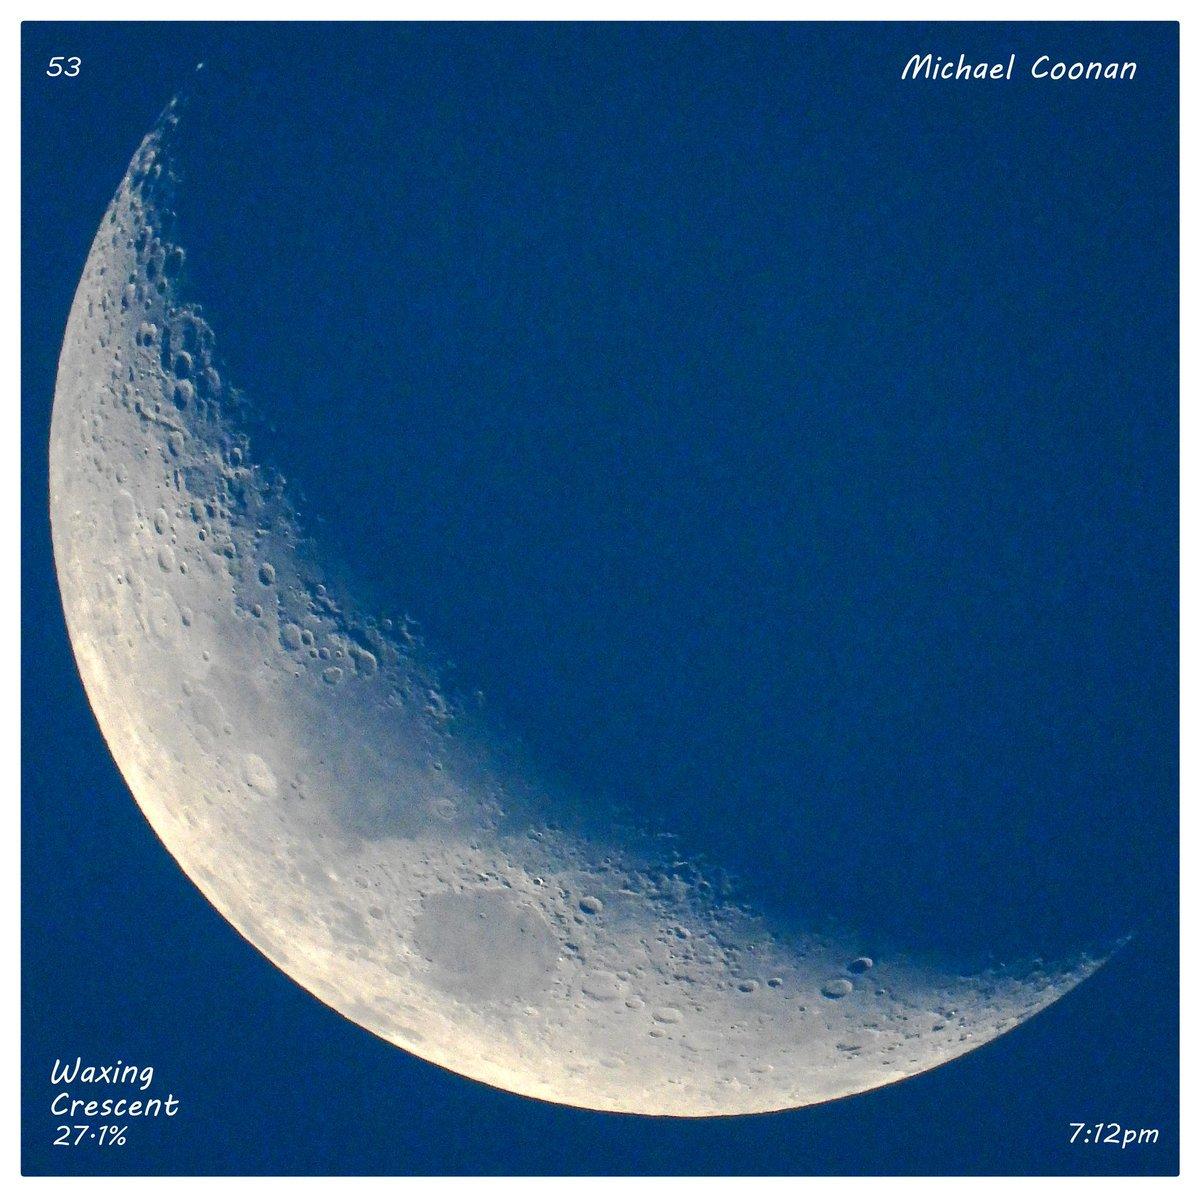 Wednesday October 21st Waxing Crescent Moon 27.1% in Wodonga Australia #StormHour #moon #luna #moonshot #Moon_awards #astrophotography #astronomy @CherScheff @KayMcCaffery1 @PicPublic @PicPoet #500pxrtg @ThePhotoHour @BonfirePictures @500pxrtg https://t.co/VBxssPNXye